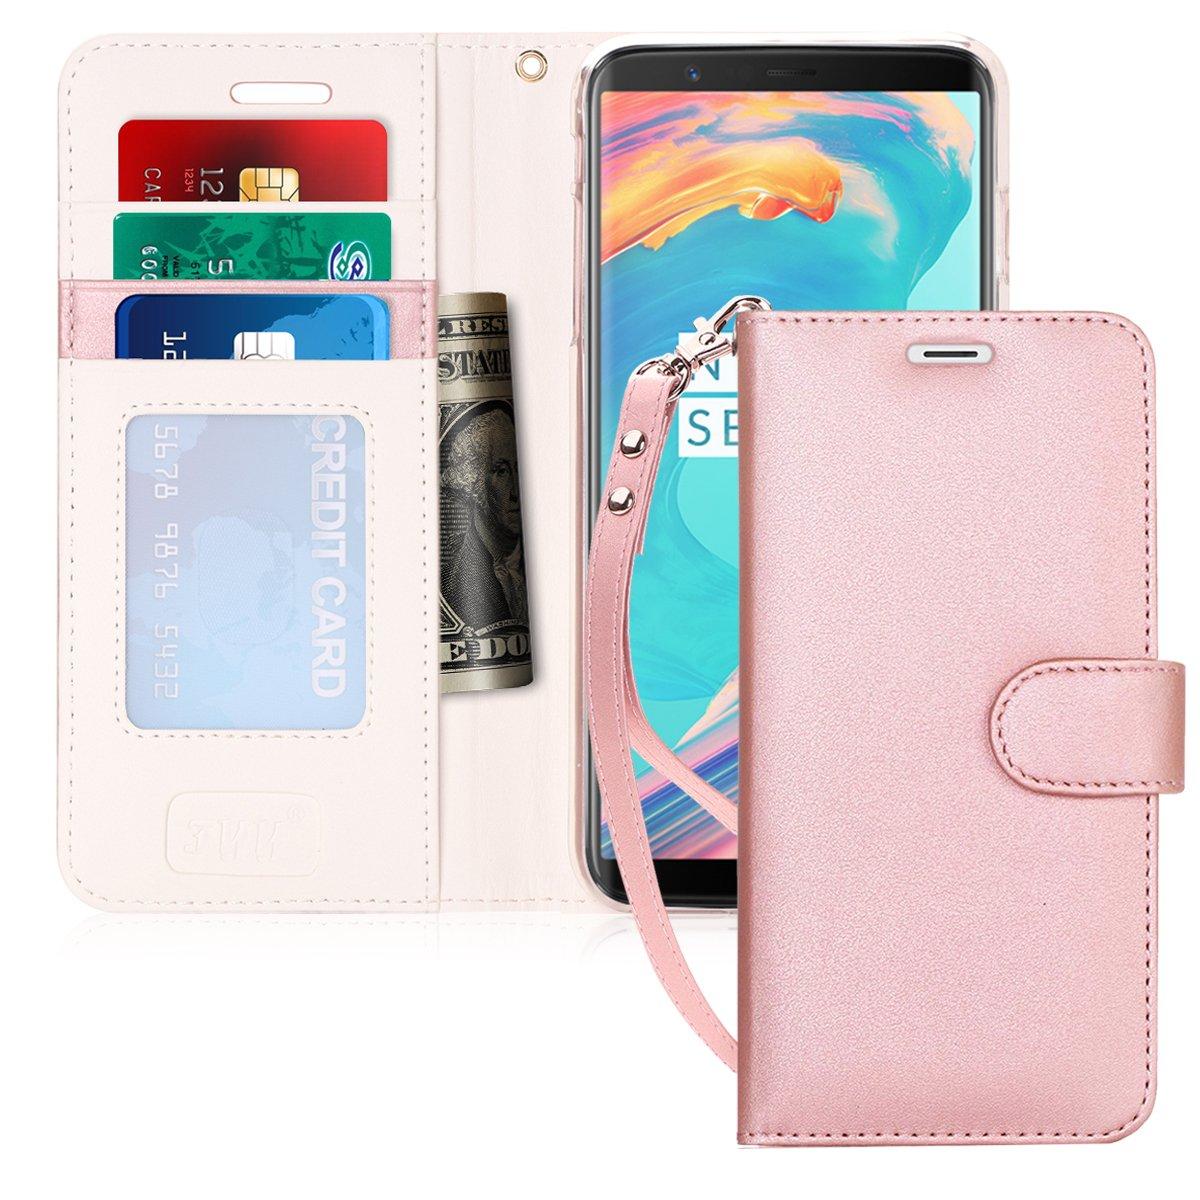 Galaxy S8 Case, Samsung Galaxy S8 Case, FYY[RFID Blocking Wallet Case] 100%  Handmade Flip Folio Case [Kickstand Feature] with ID&Credit Card Protector